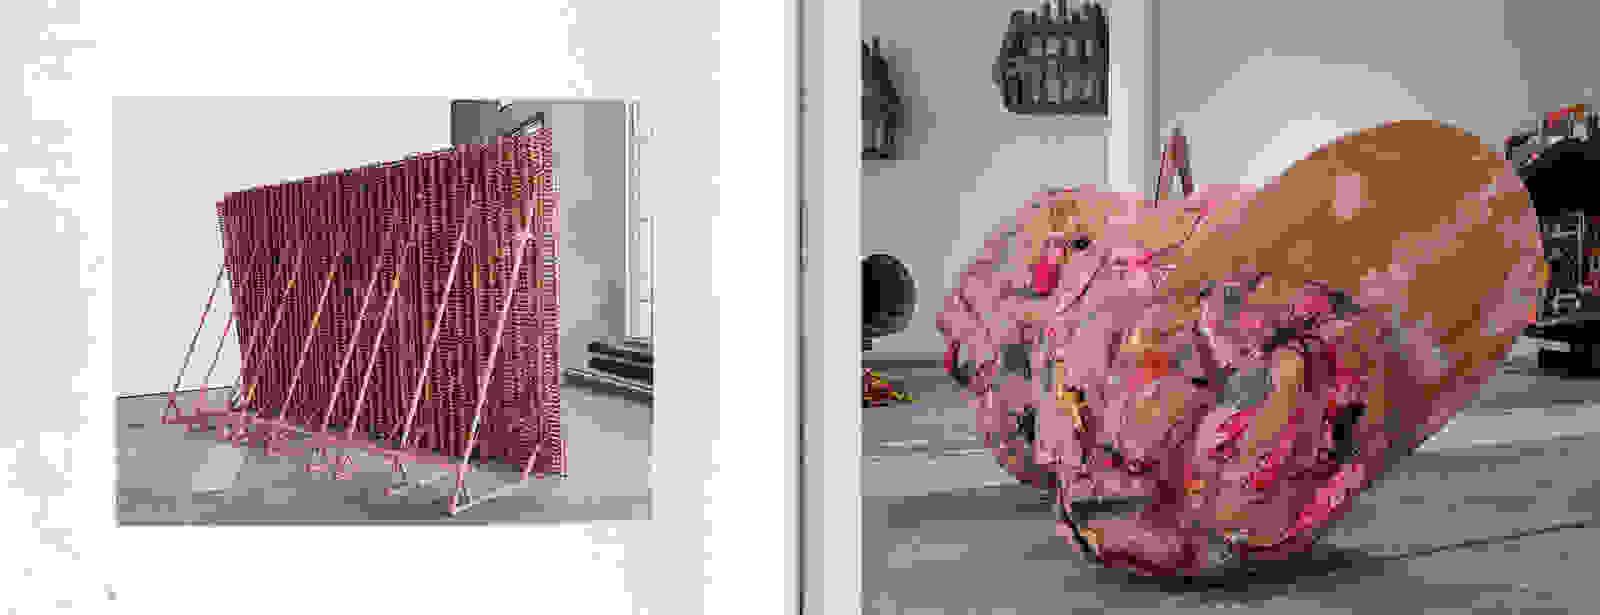 Phyllida Barlow DS 1600x615 3